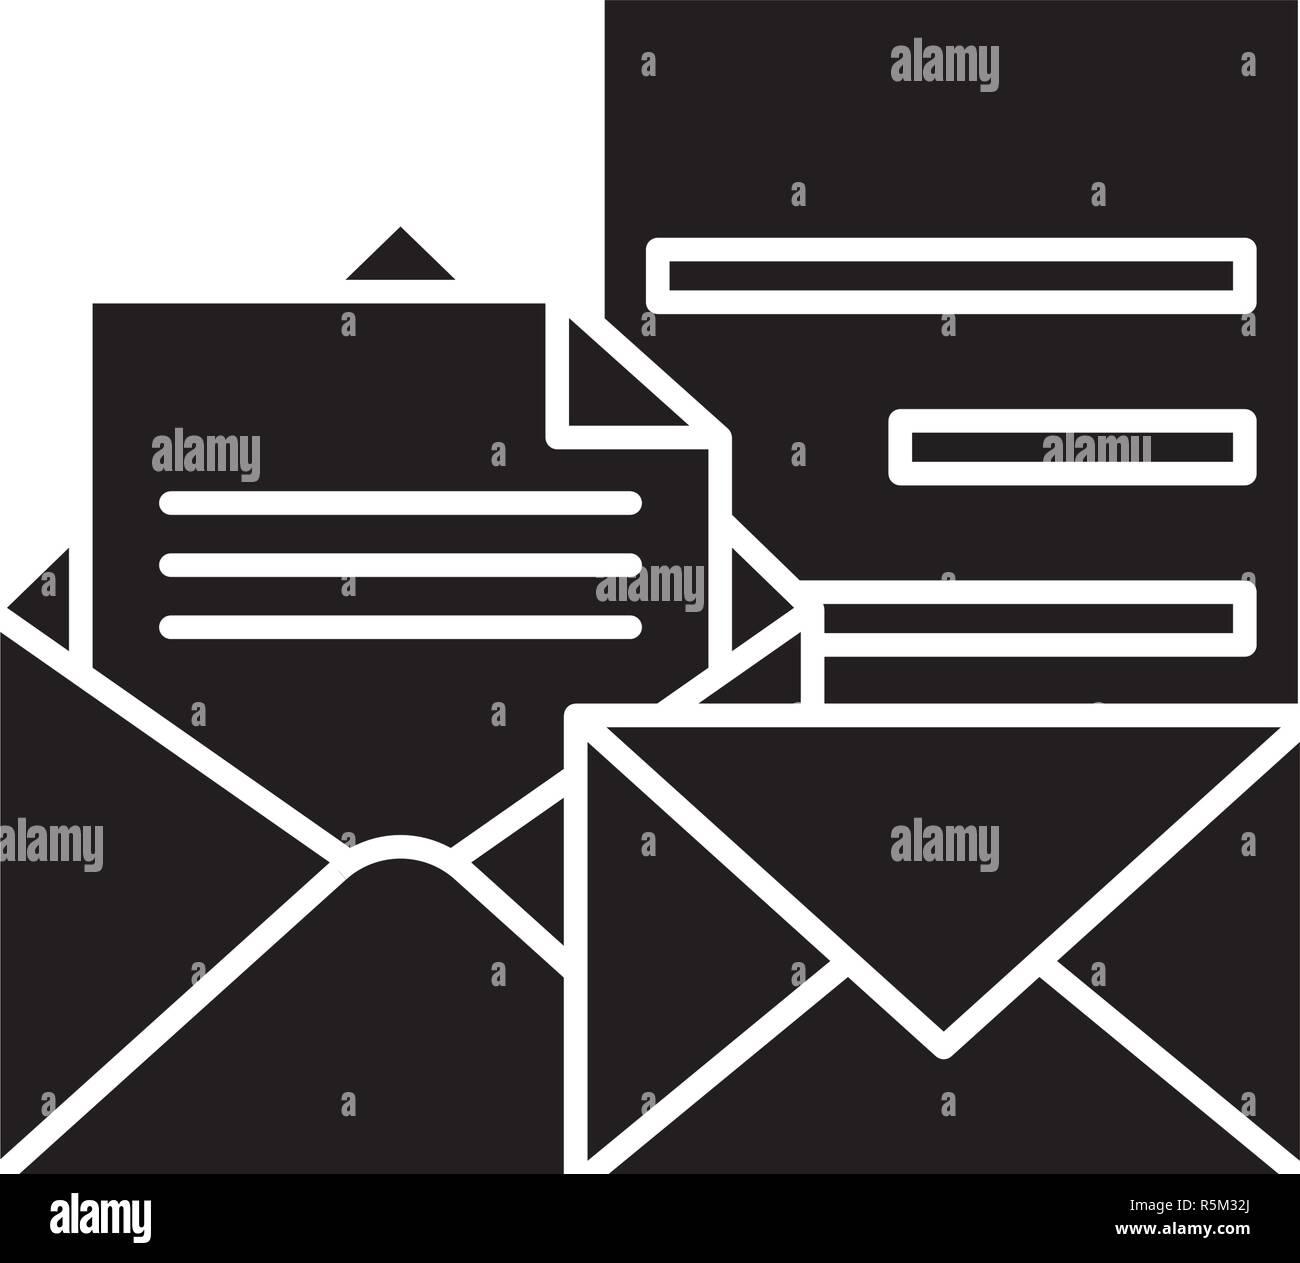 Direct marketing black icon, vector sign on isolated background. Direct marketing concept symbol, illustration  - Stock Image